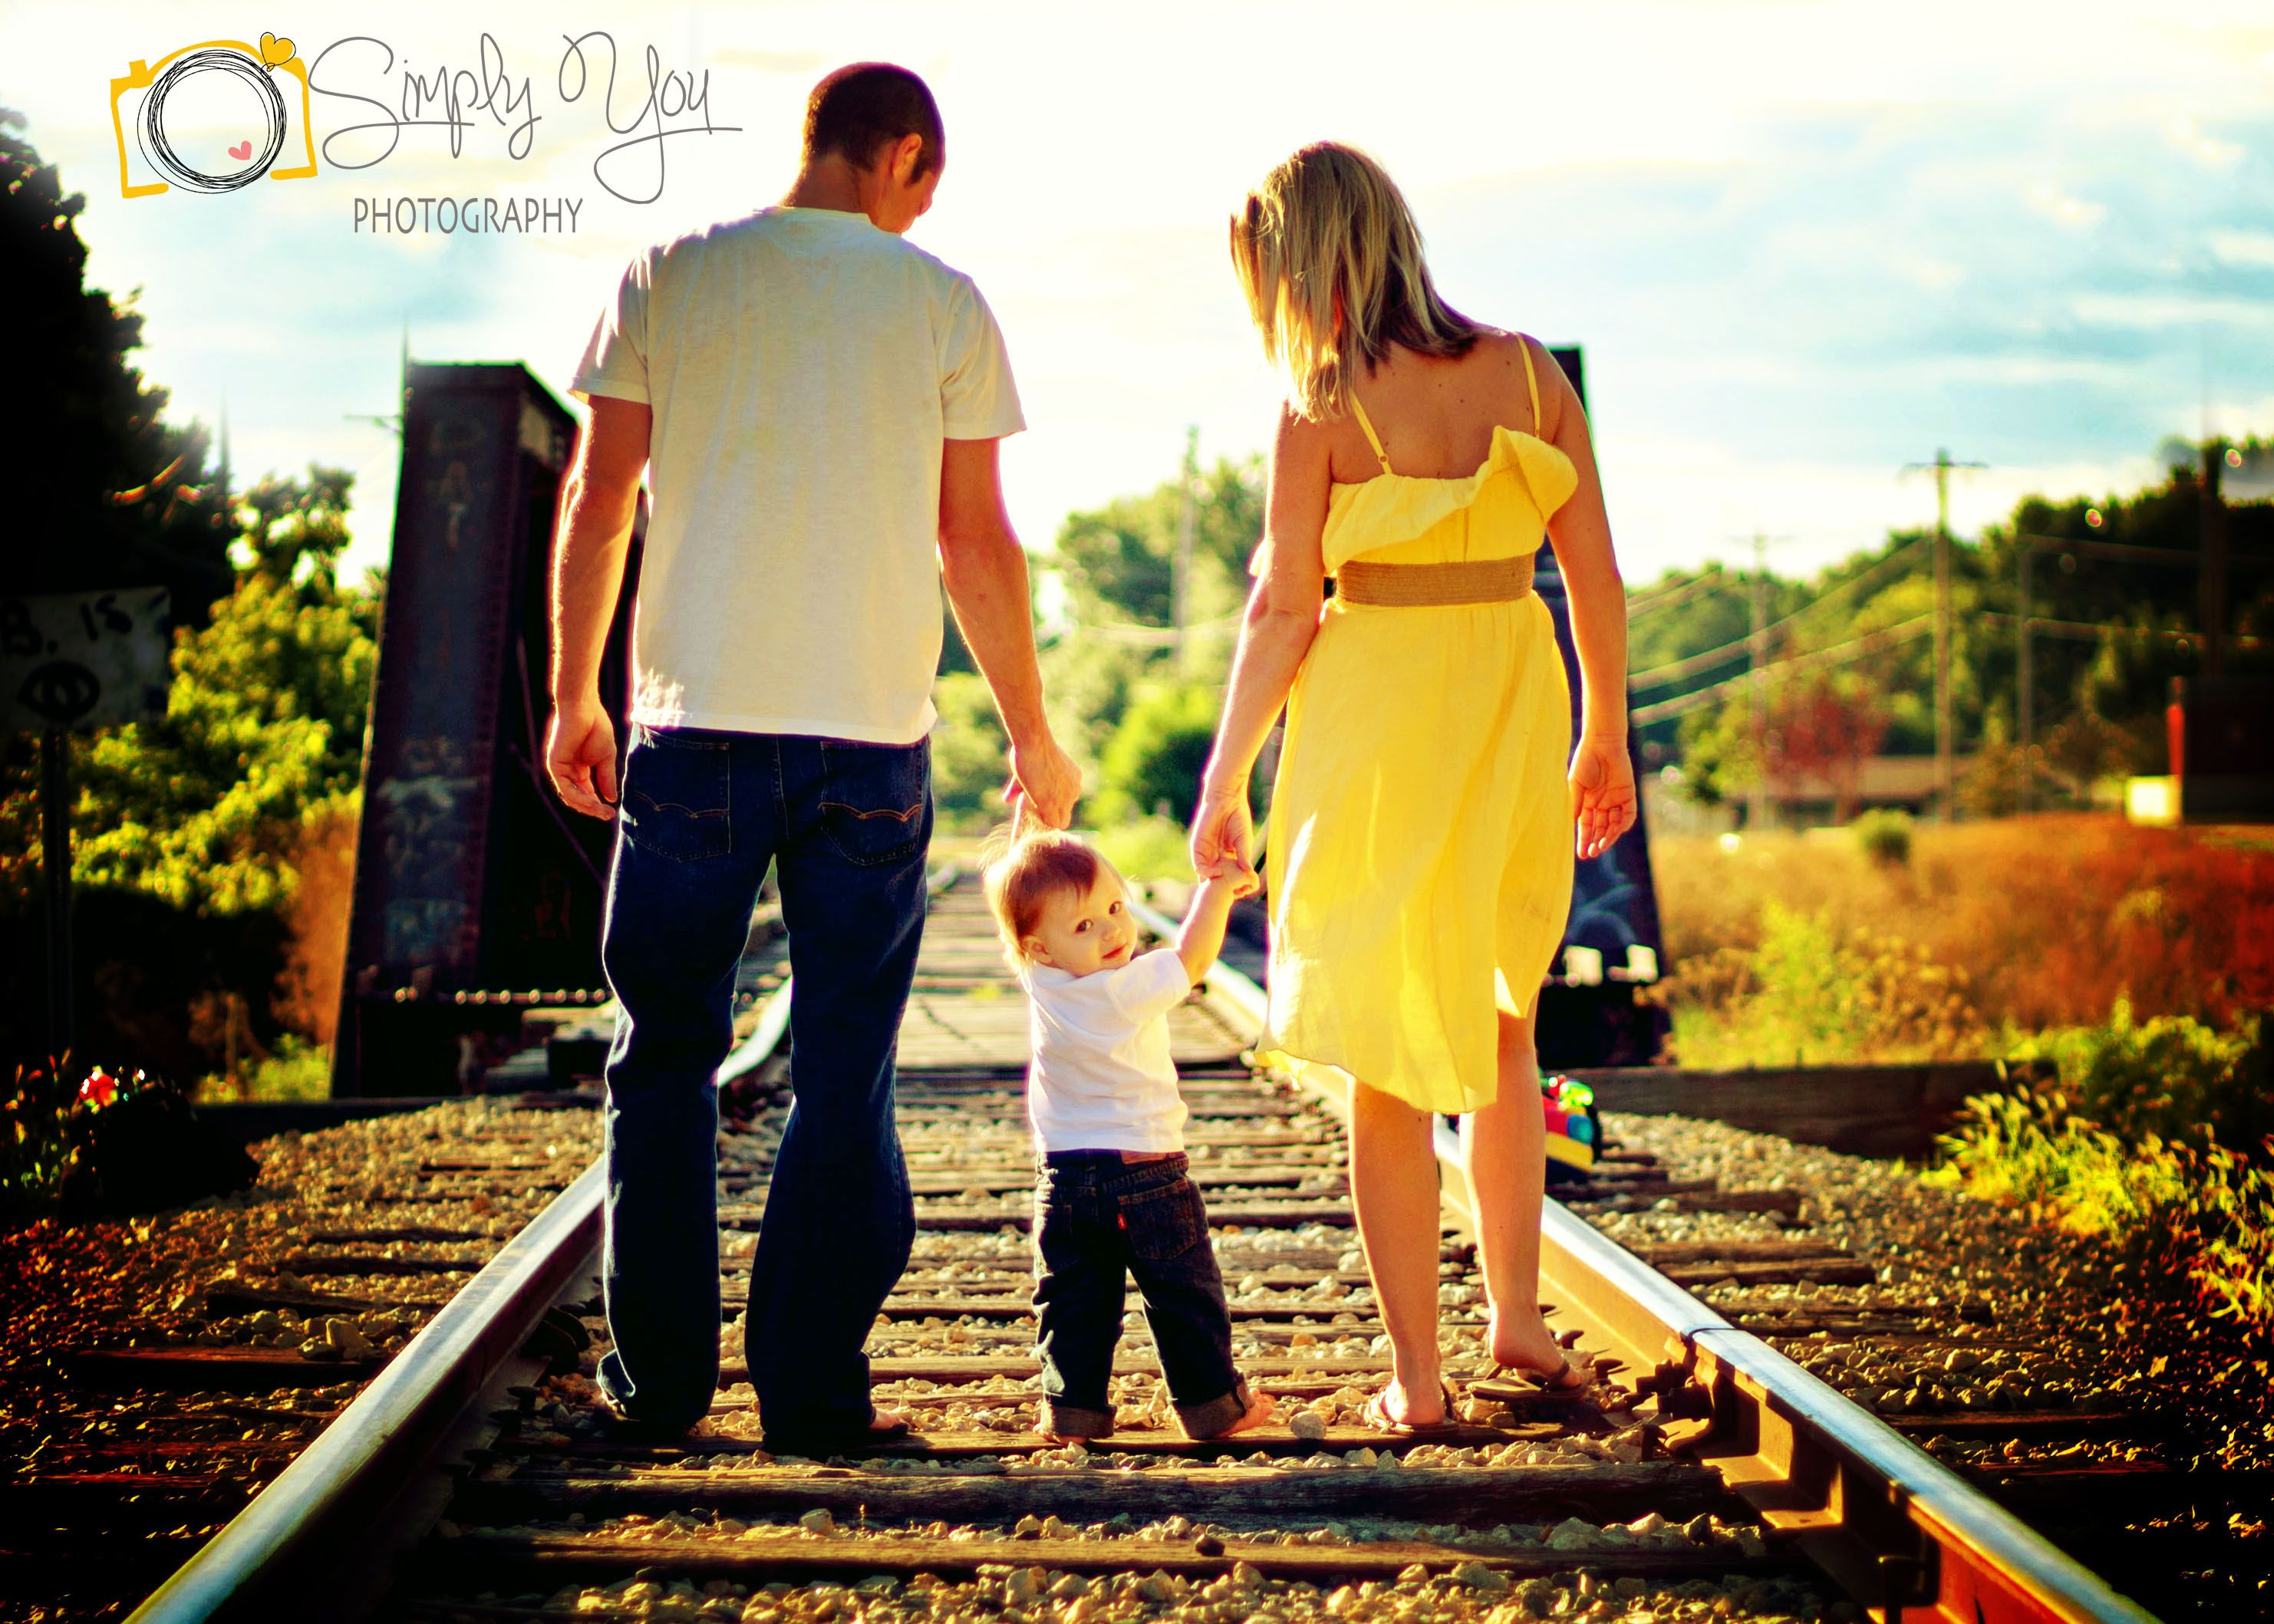 Family Train Track Picture  #SimplyYouPhotography https://www.facebook.com/SimplyYouPhotography1